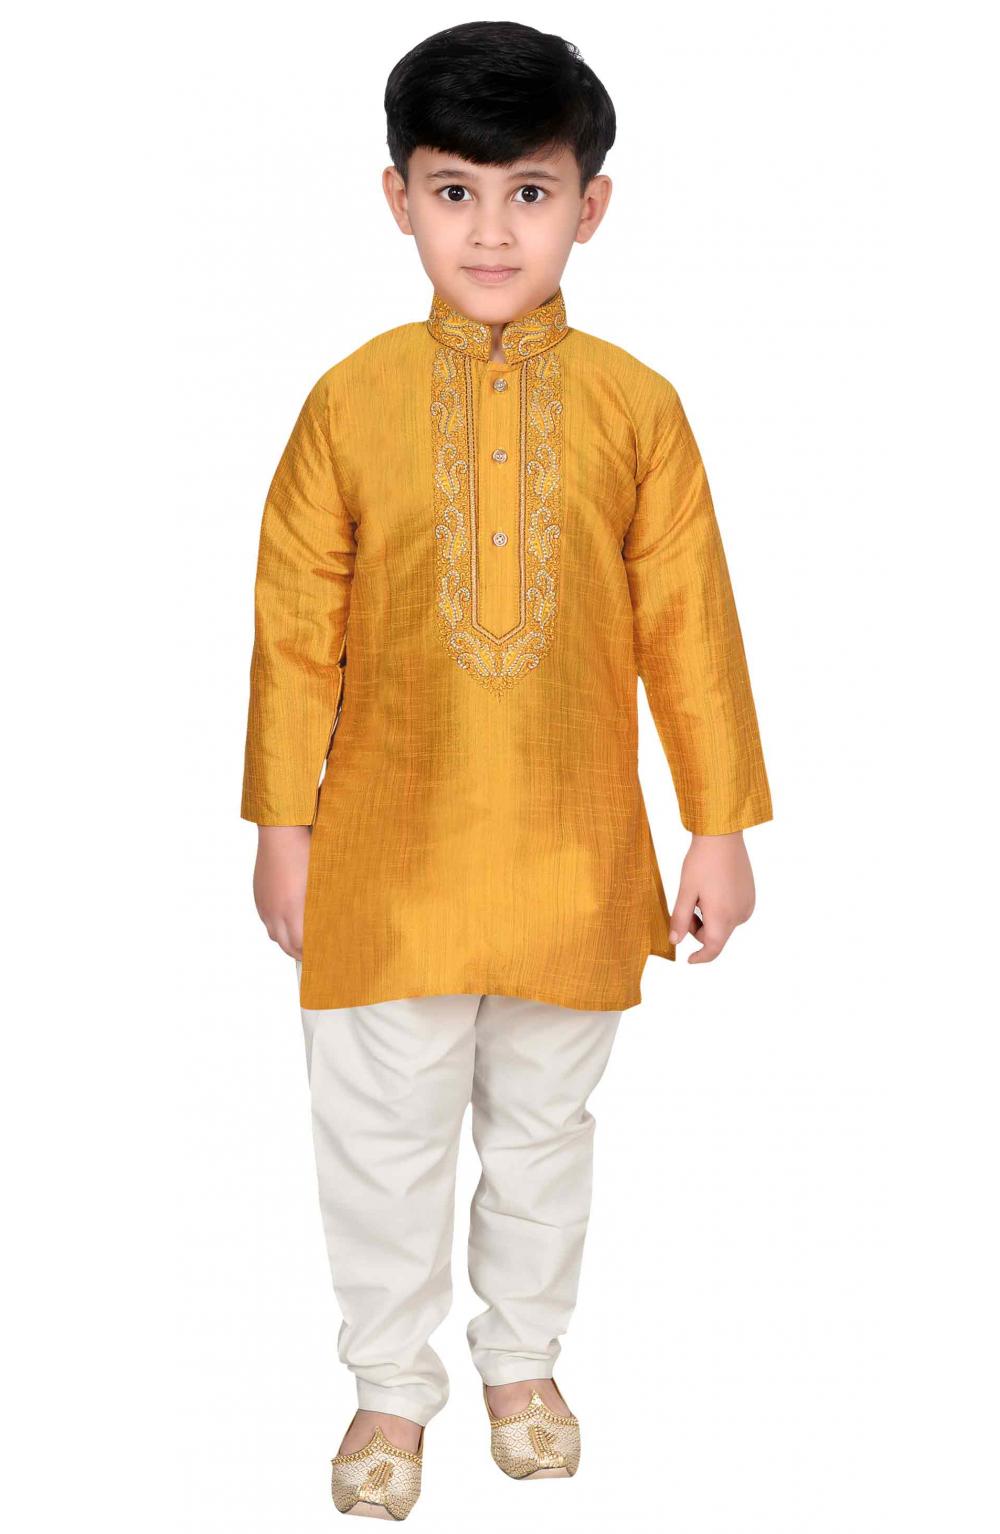 Boys Indian Sherwani Kurta Churidar Salwar Kameez Bollywood theme party 845